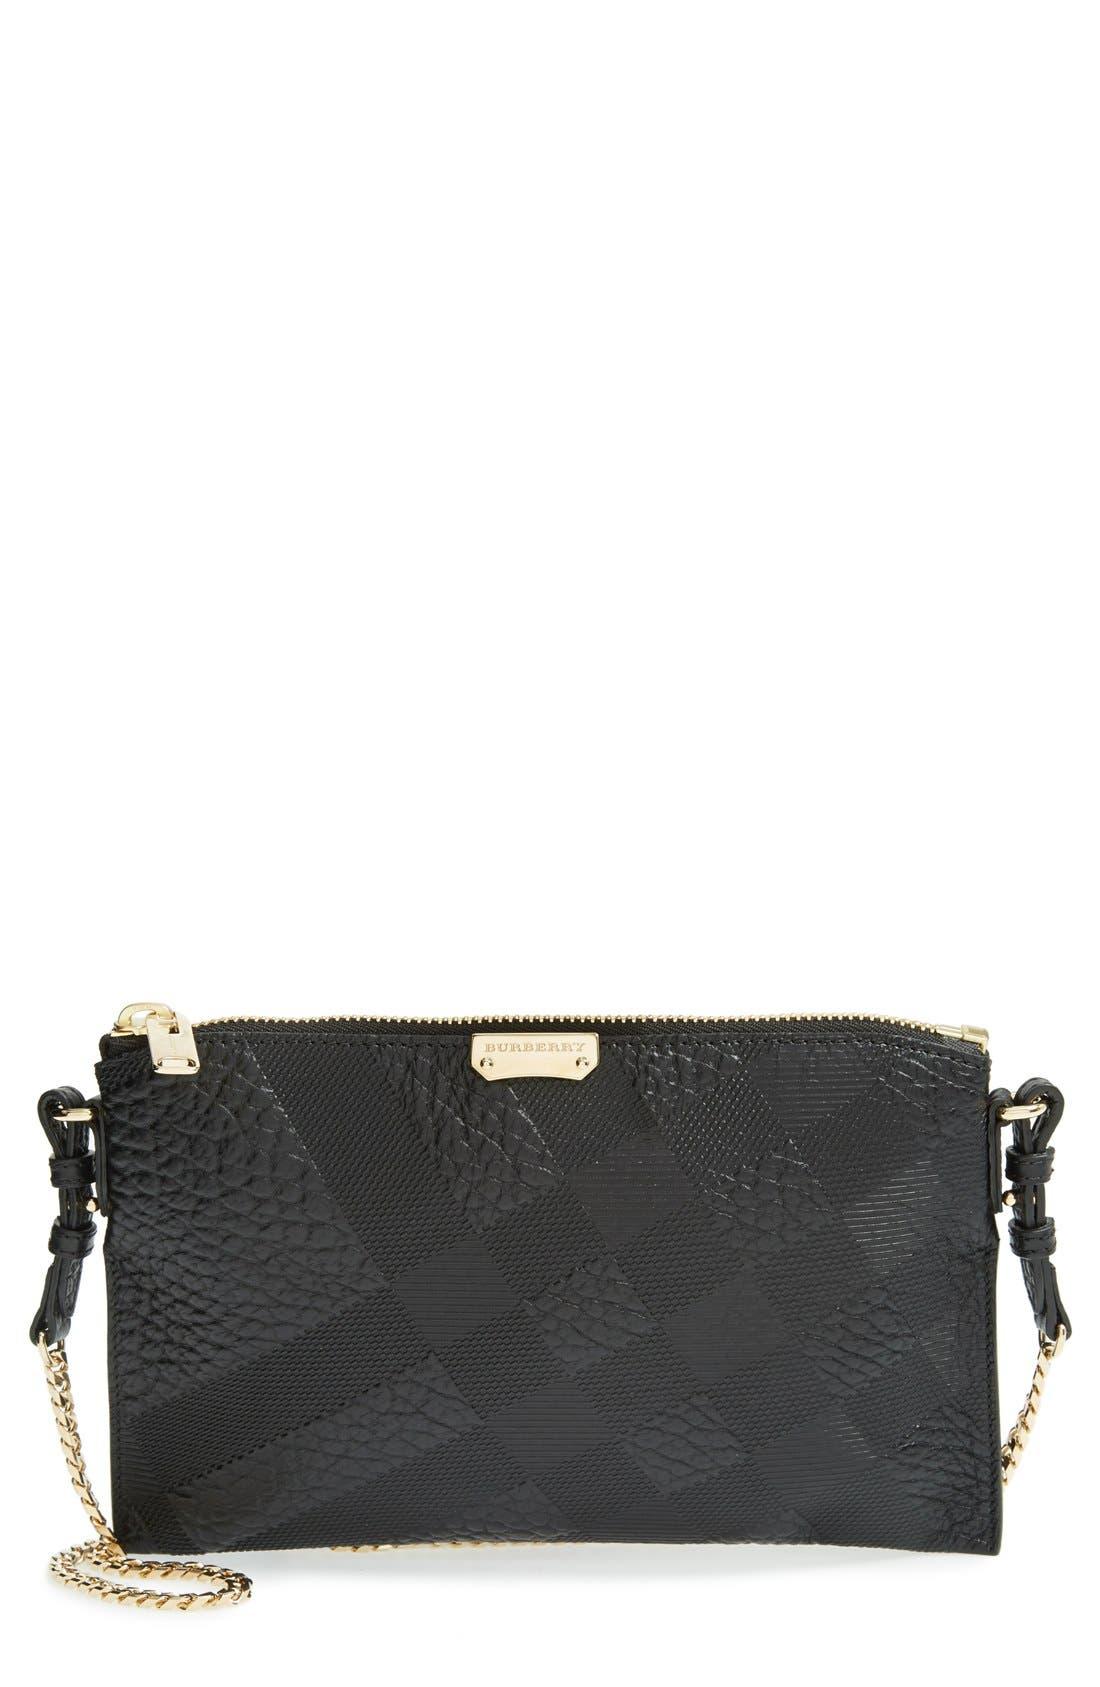 Alternate Image 1 Selected - Burberry 'Peyton - Grain Check' Embossed Leather Crossbody Bag